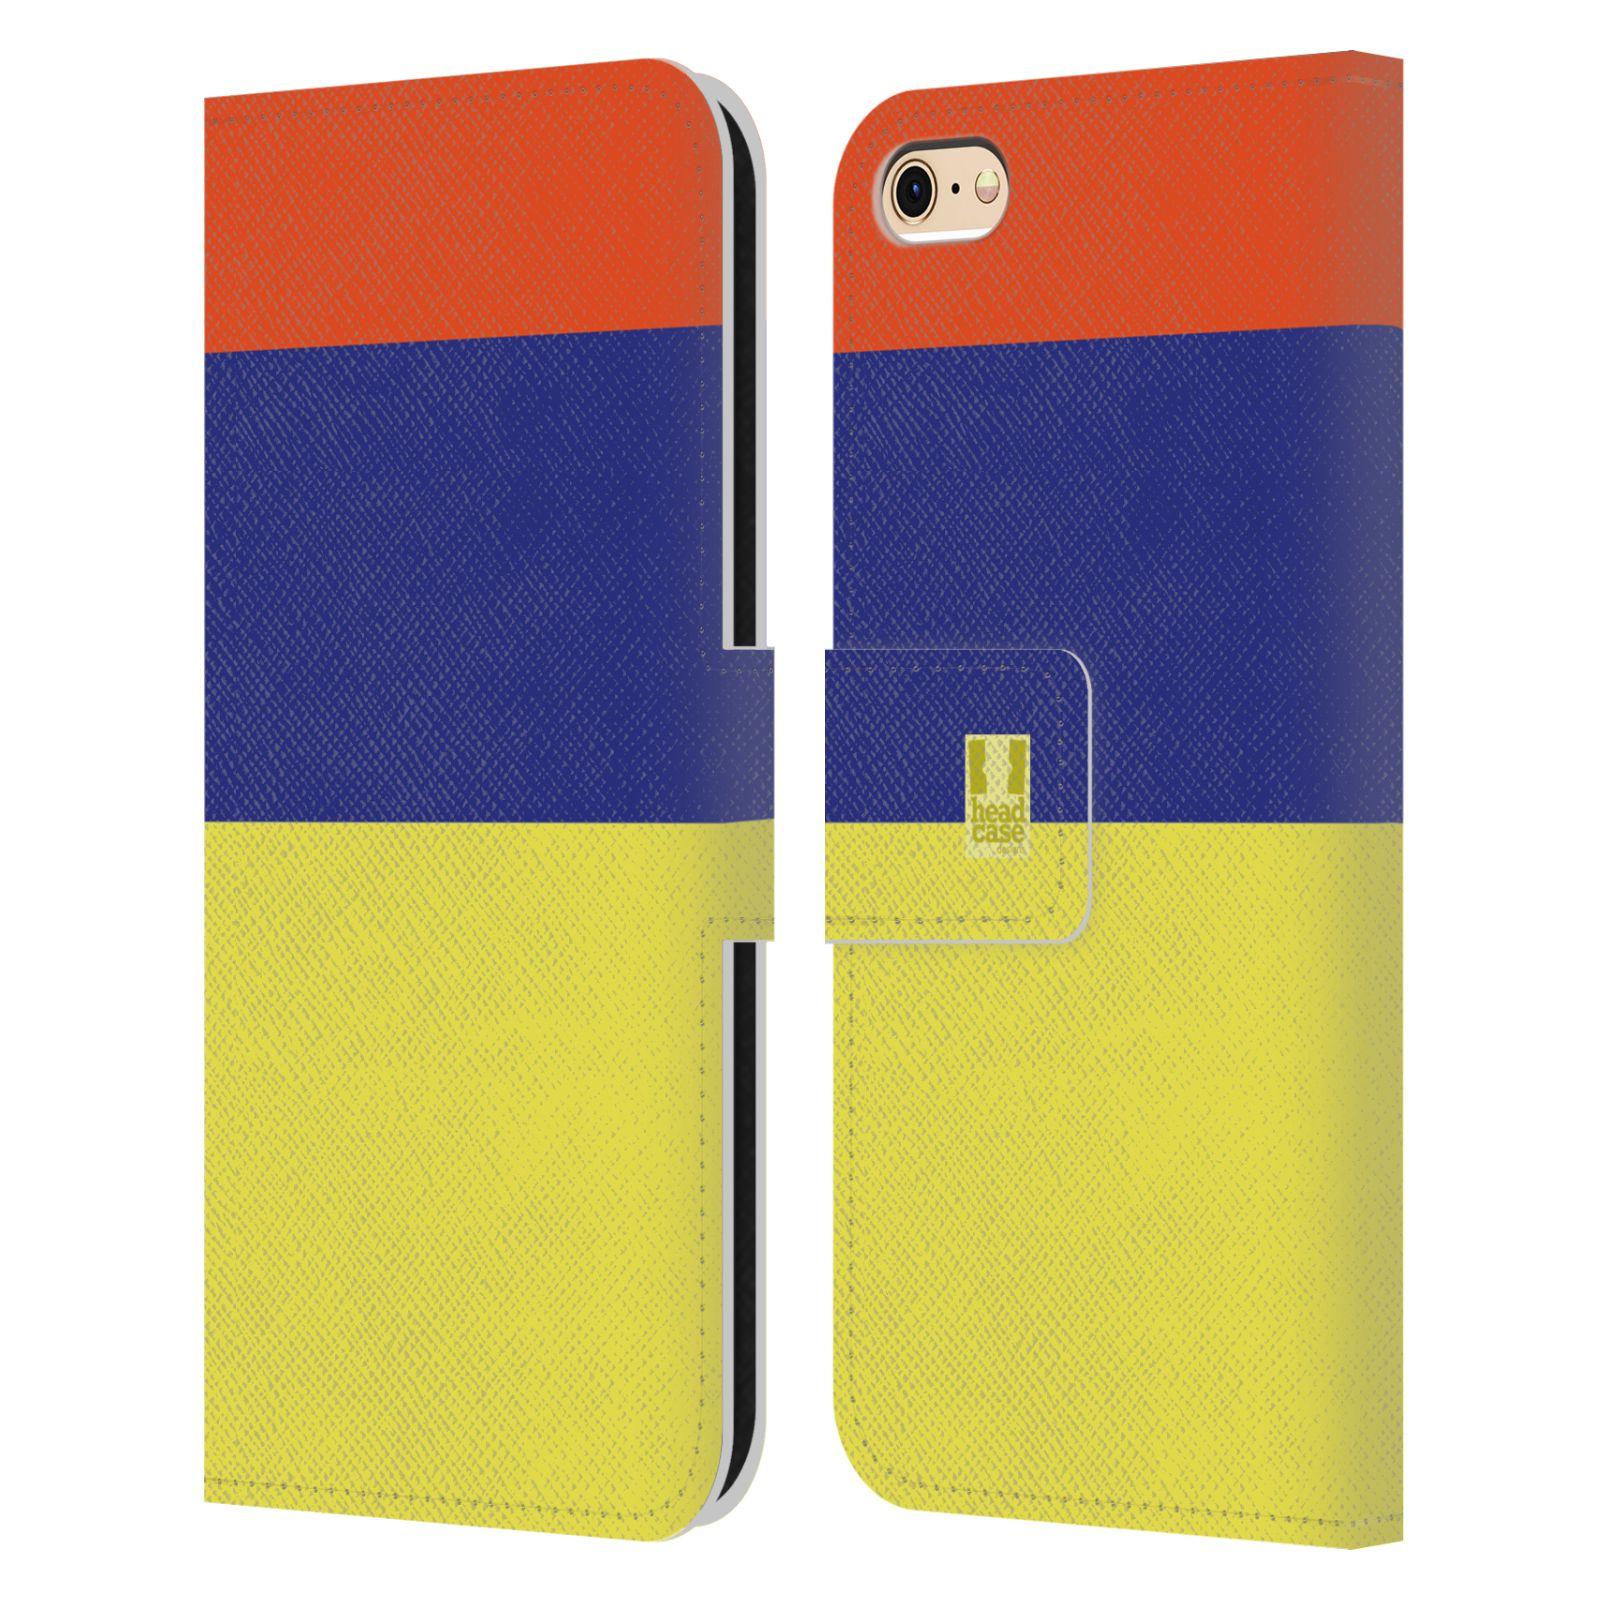 HEAD CASE Flipové pouzdro pro mobil Apple Iphone 6/6s barevné tvary žlutá, modrá, červená